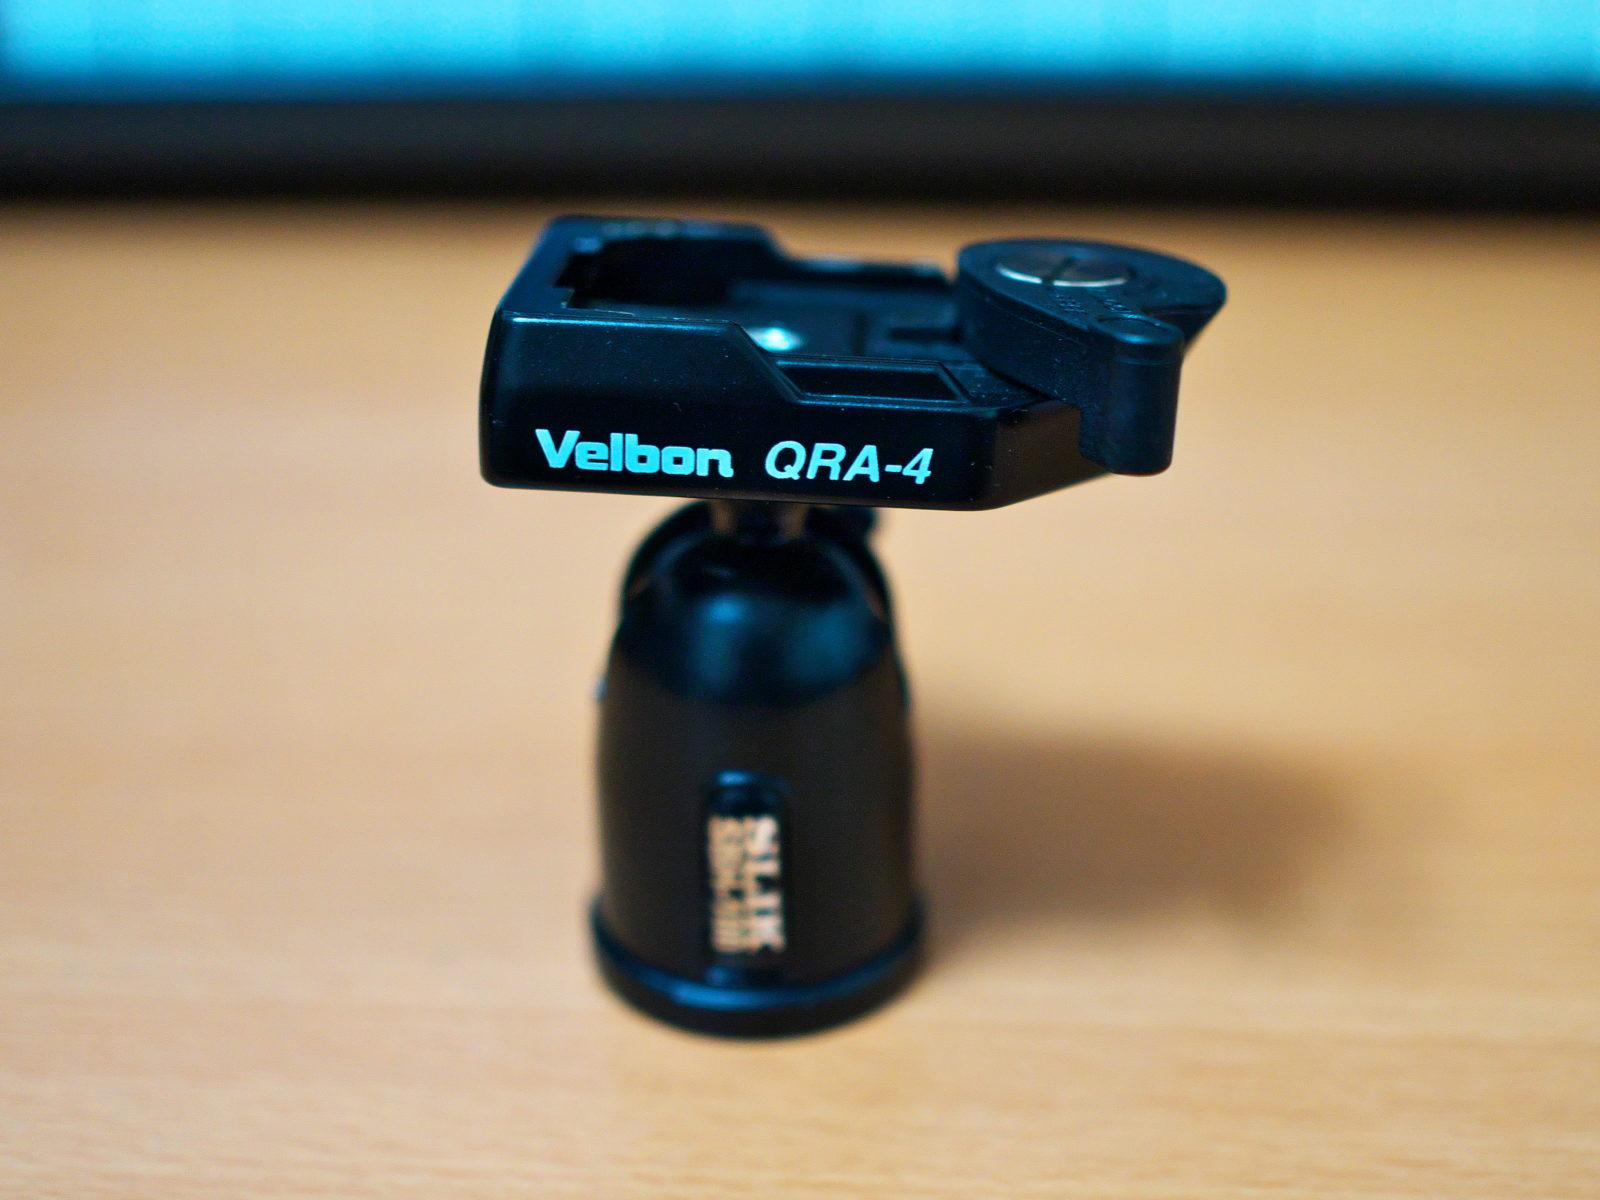 SLIK SBH-100 + Velbon QRA-4